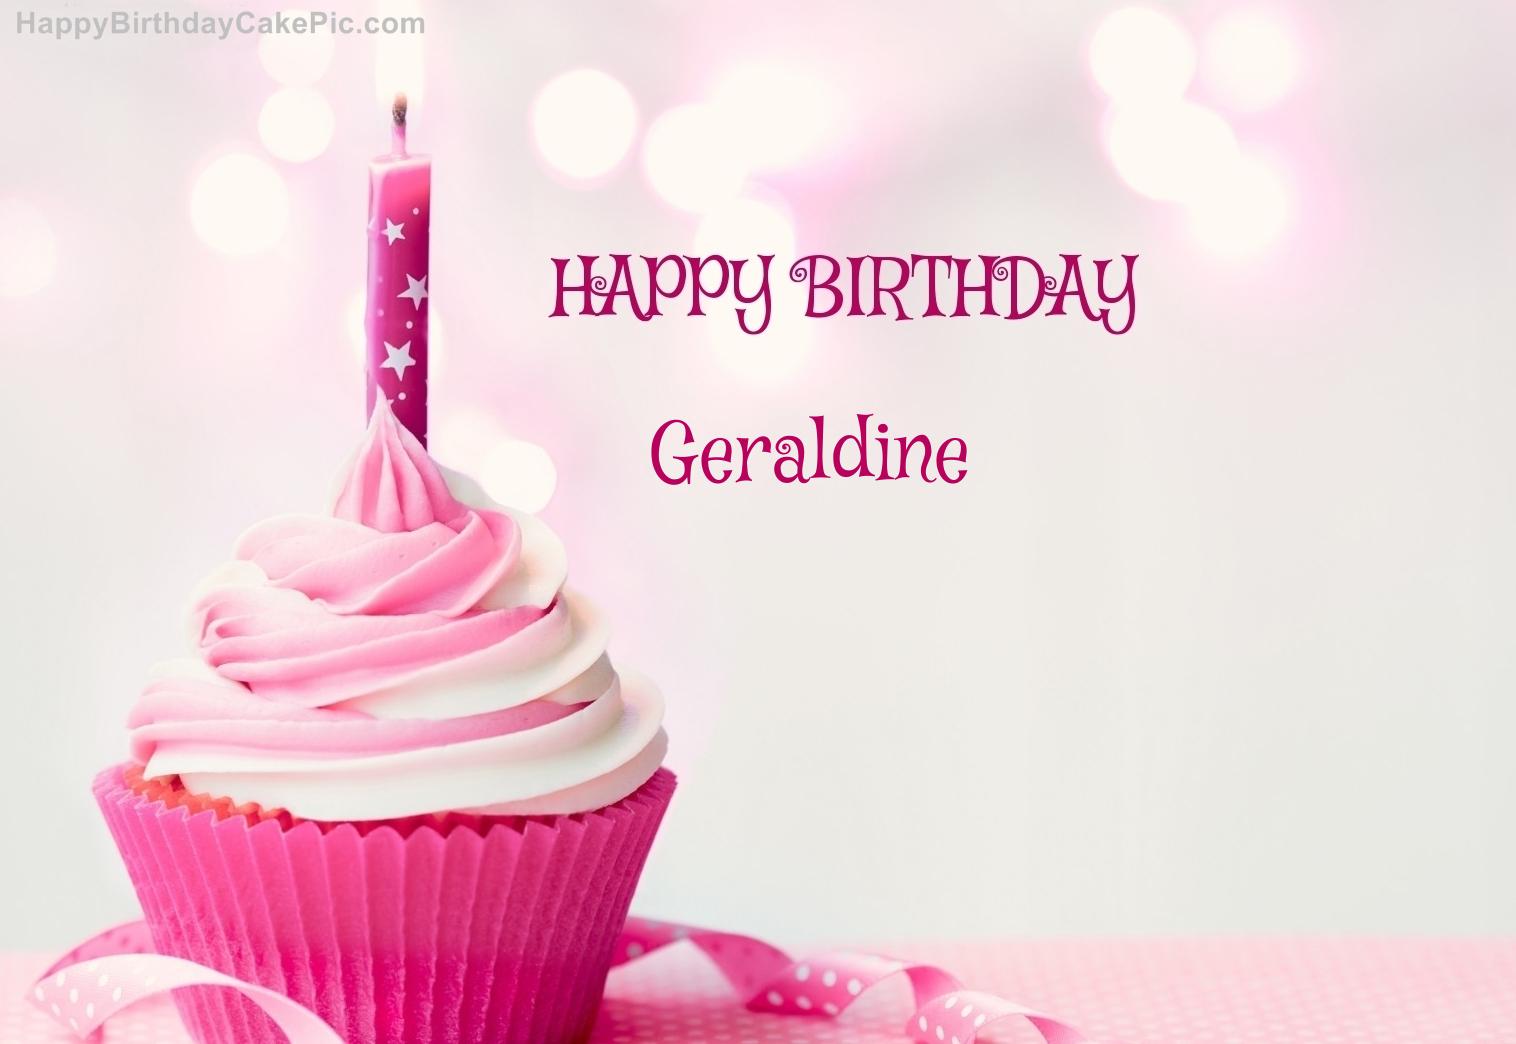 ️ Happy Birthday Cupcake Candle Pink Cake For Geraldine